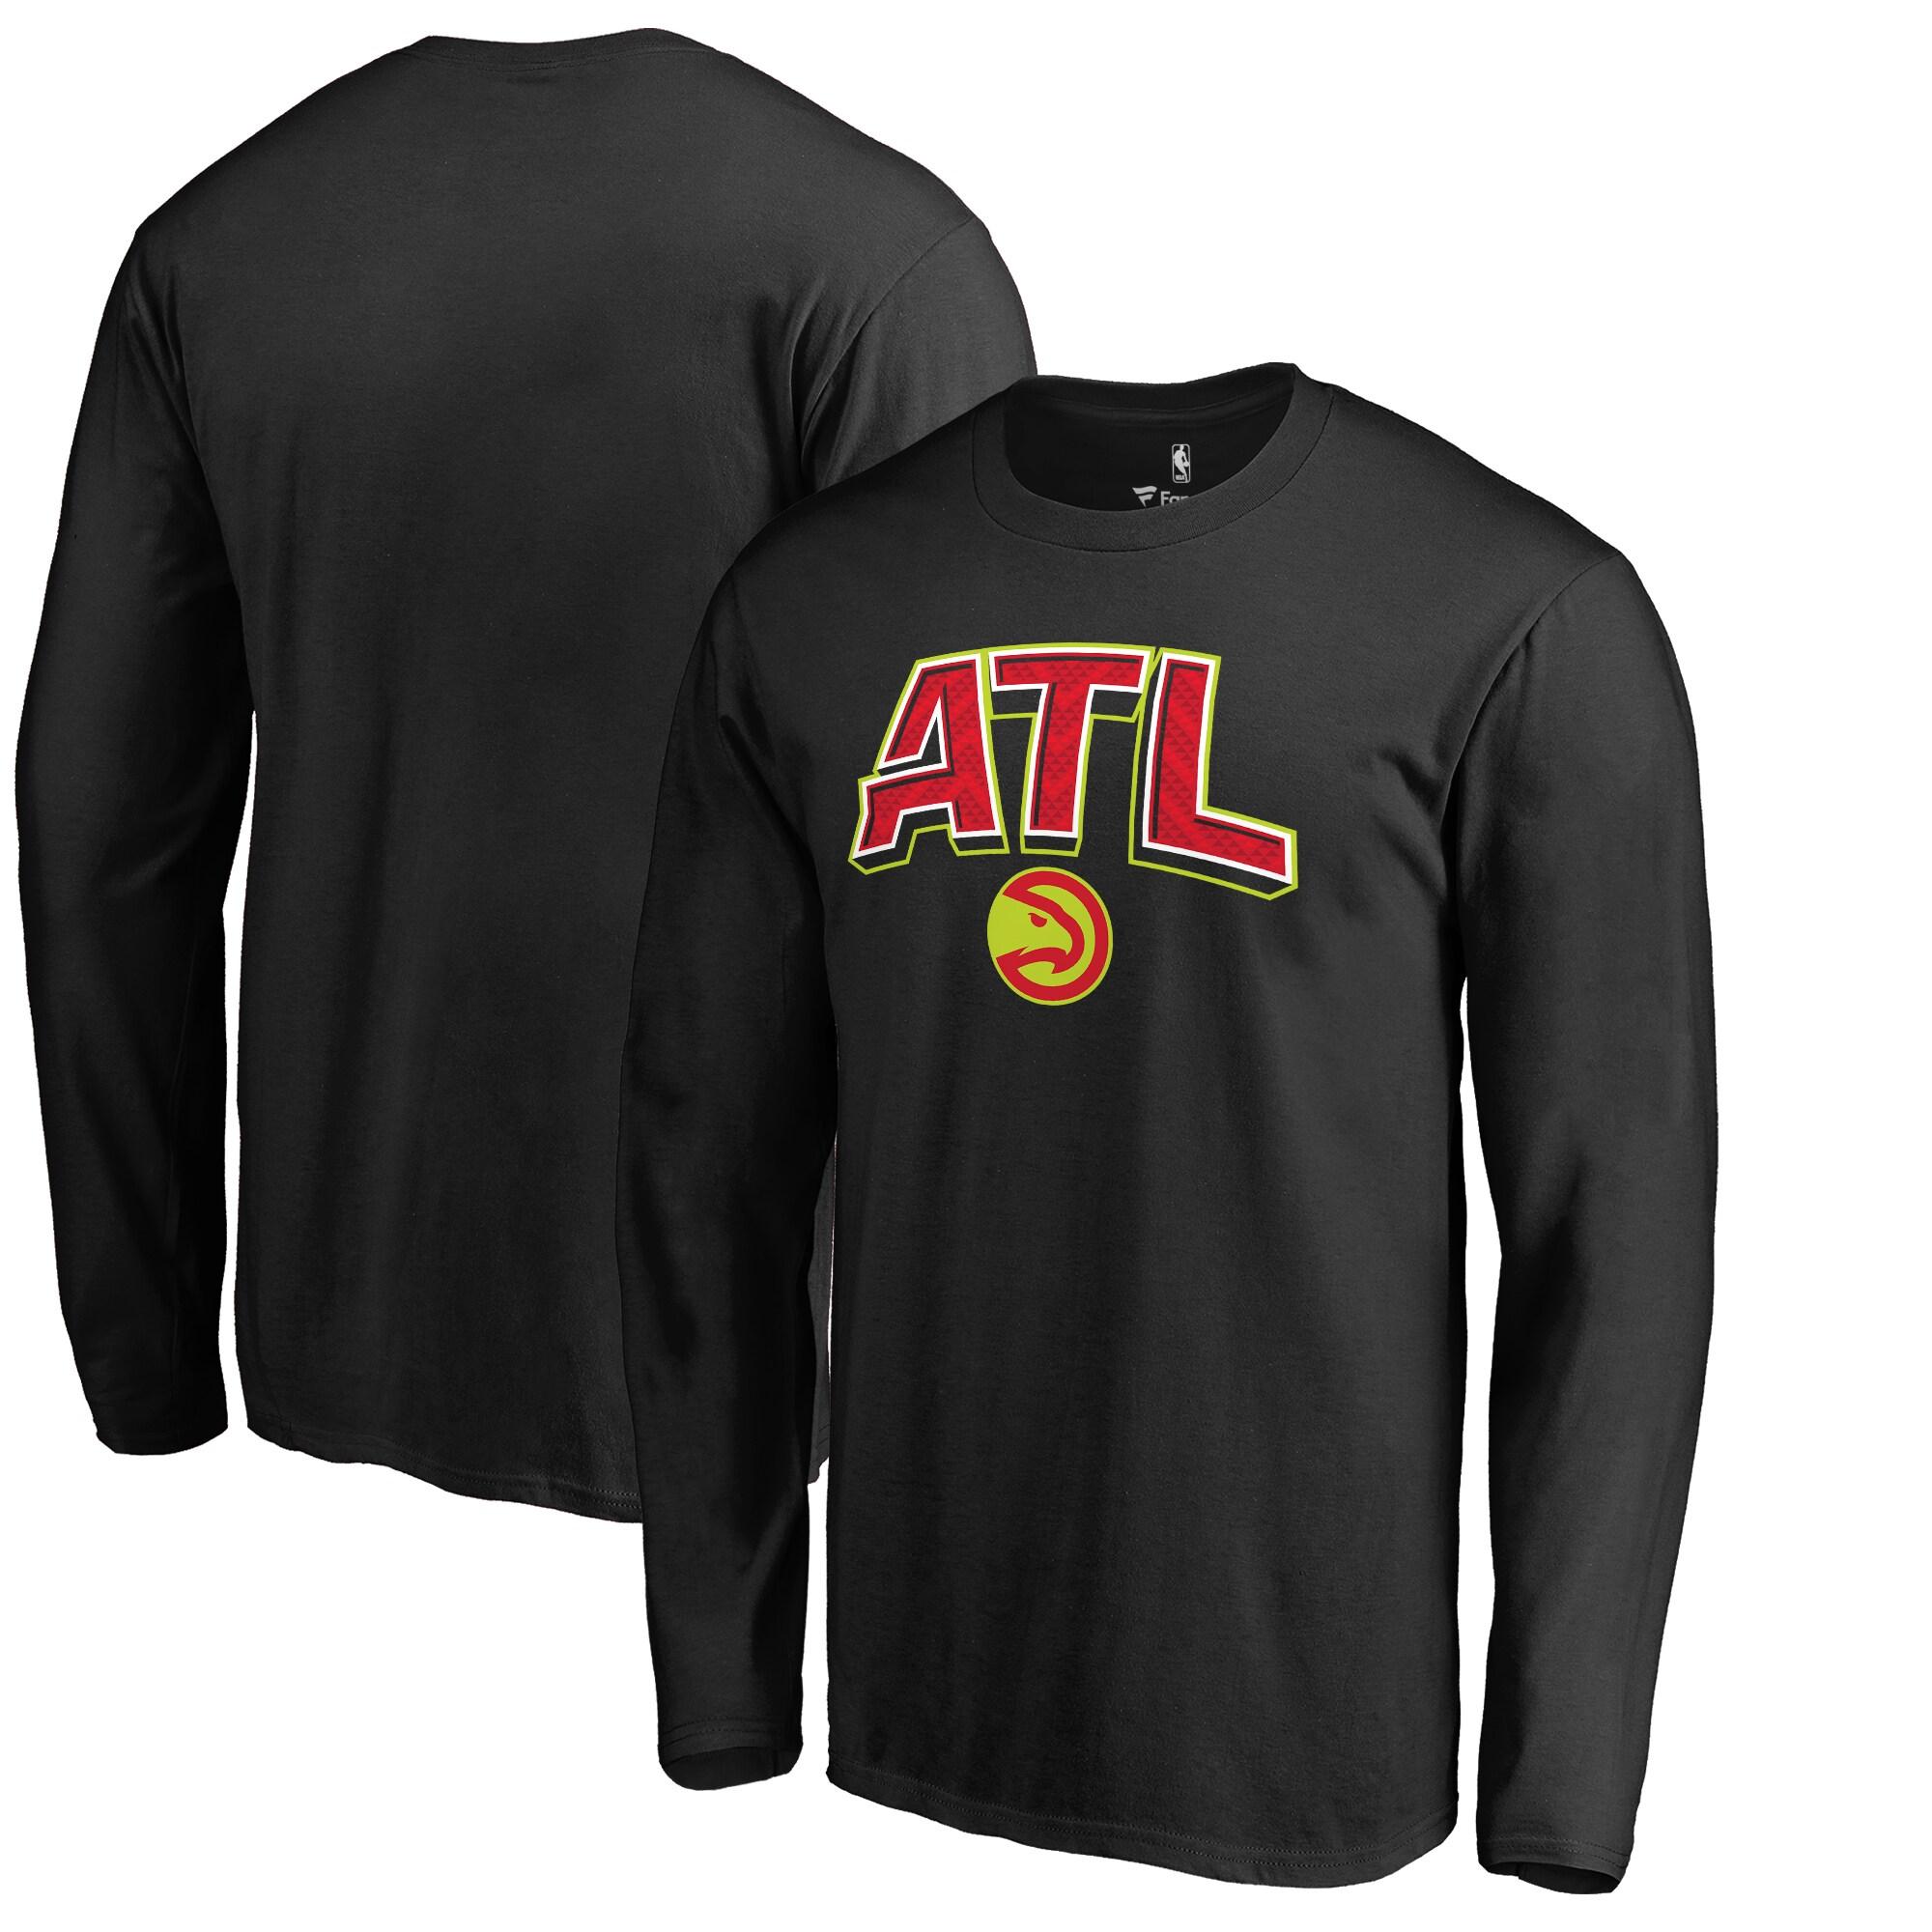 Atlanta Hawks Fanatics Branded Big & Tall ATL Hometown Collection Long Sleeve T-Shirt - Black